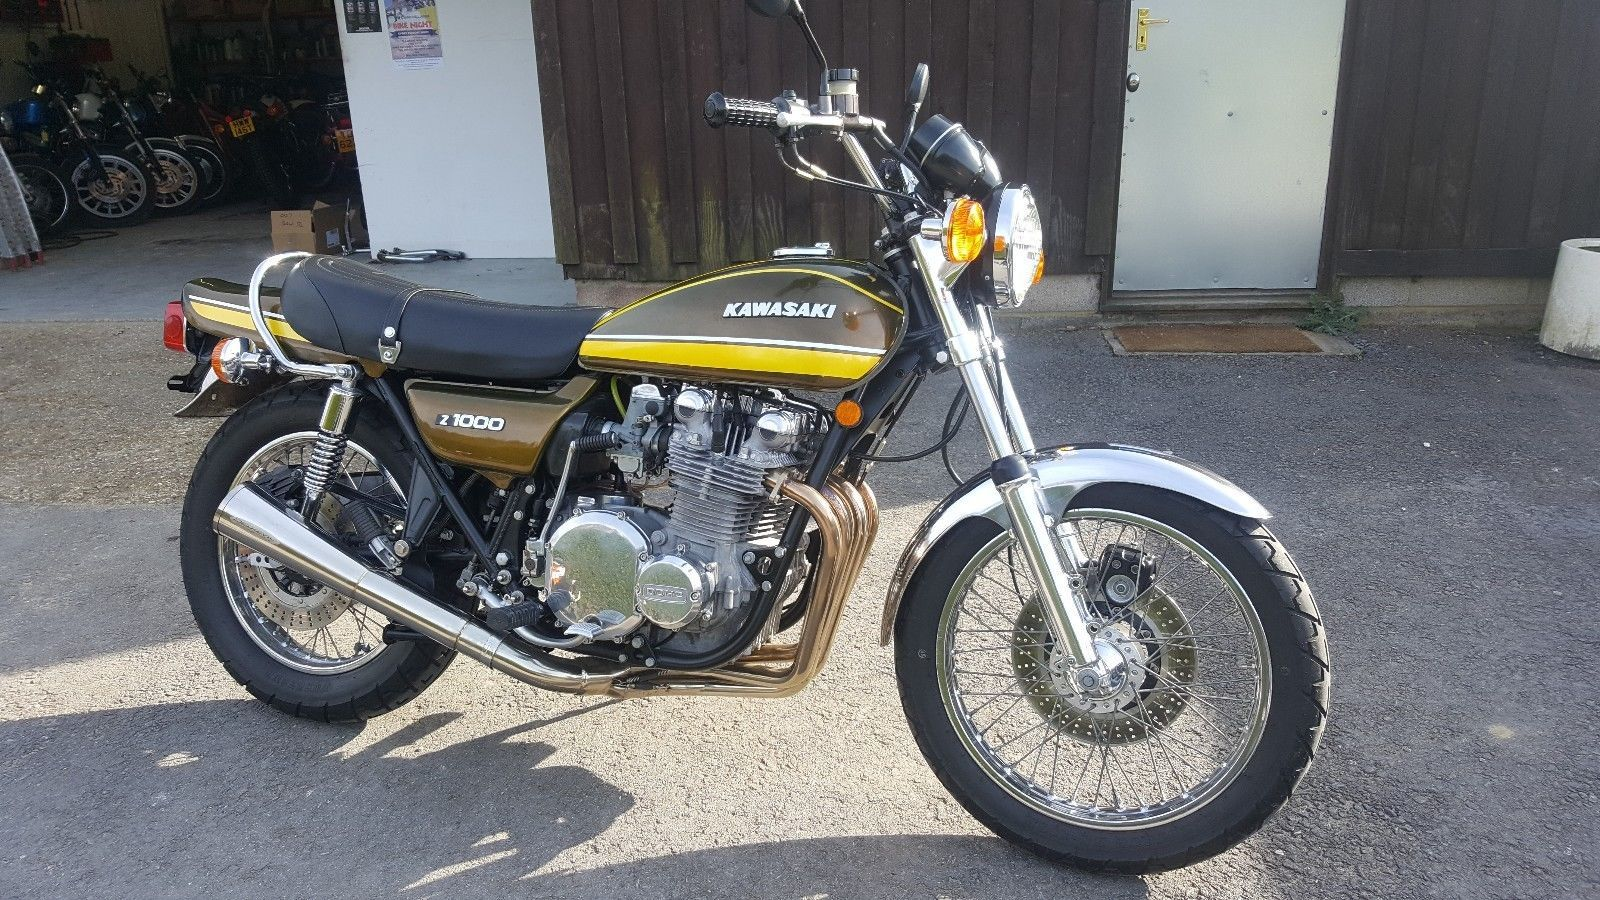 ebay ebay kawasaki z1000 a1 classic motorcycles 1970s. Black Bedroom Furniture Sets. Home Design Ideas